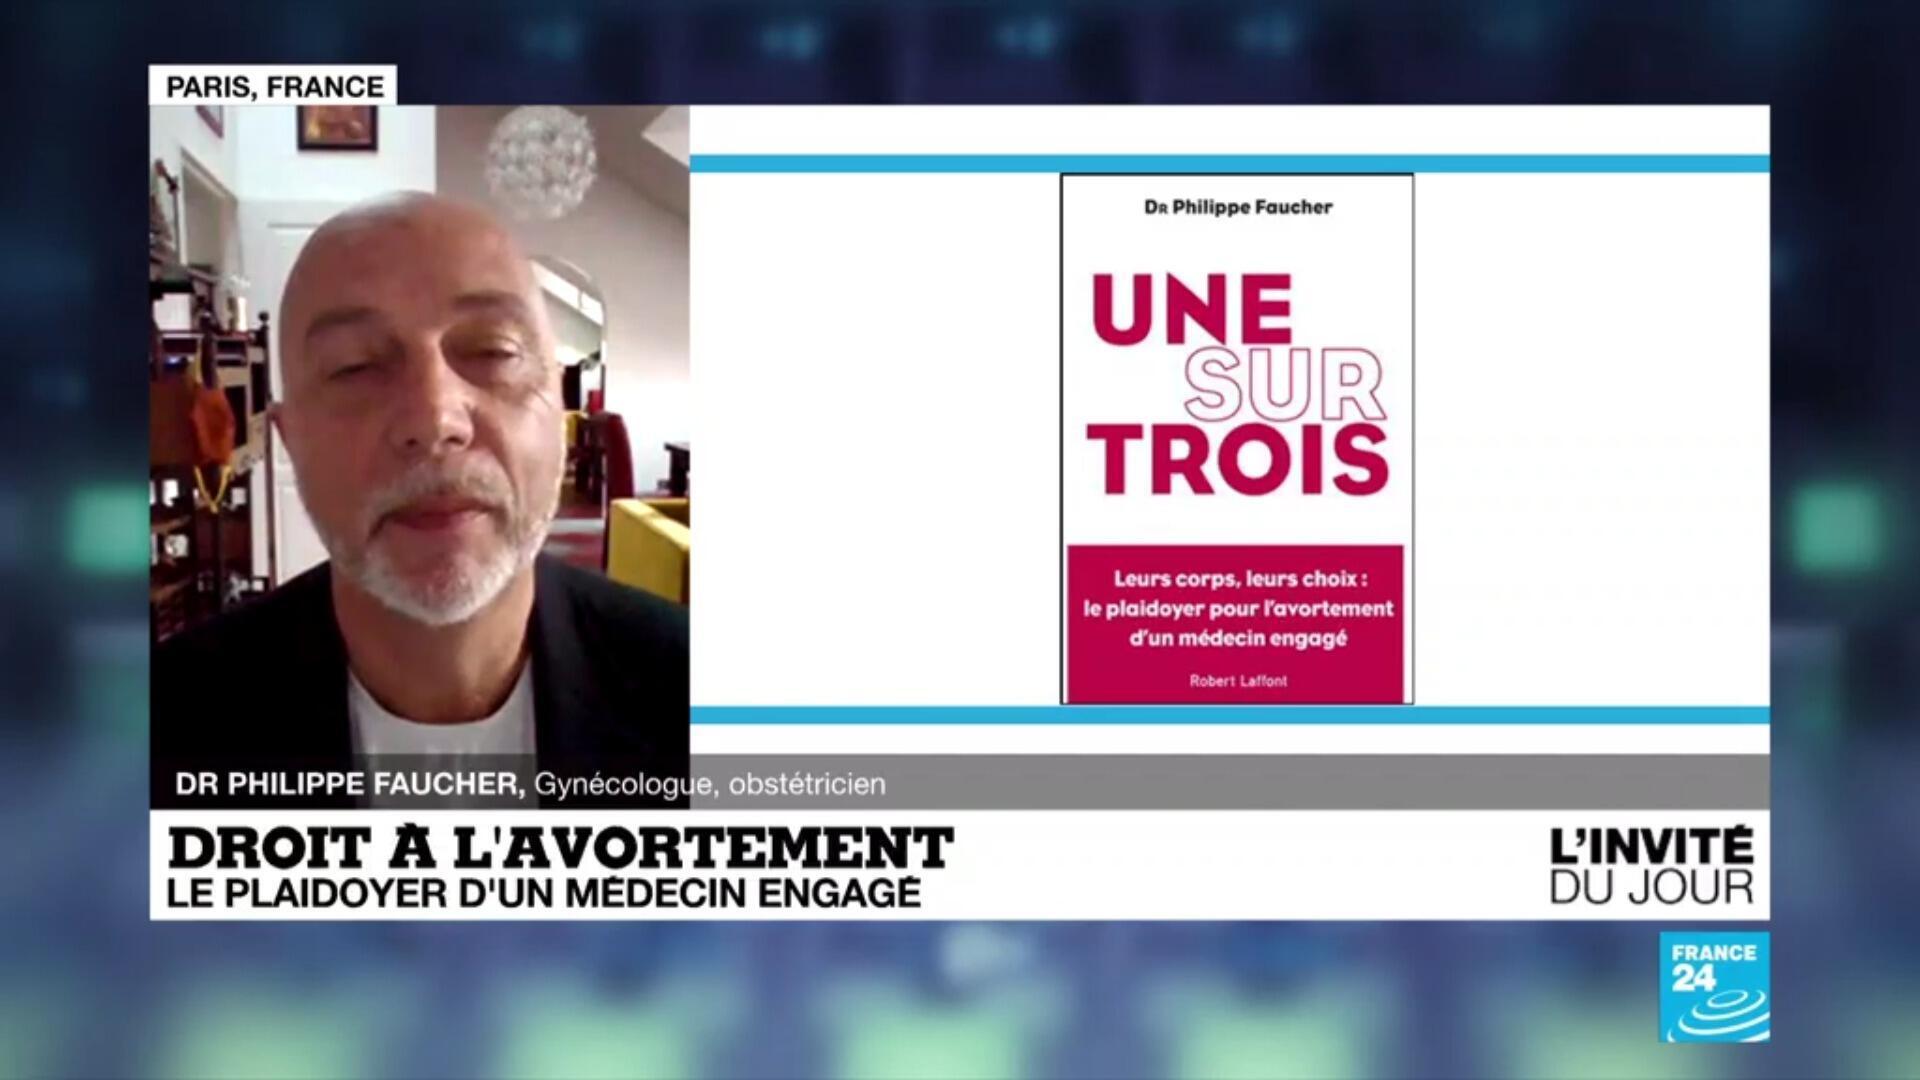 Philippe Faucher